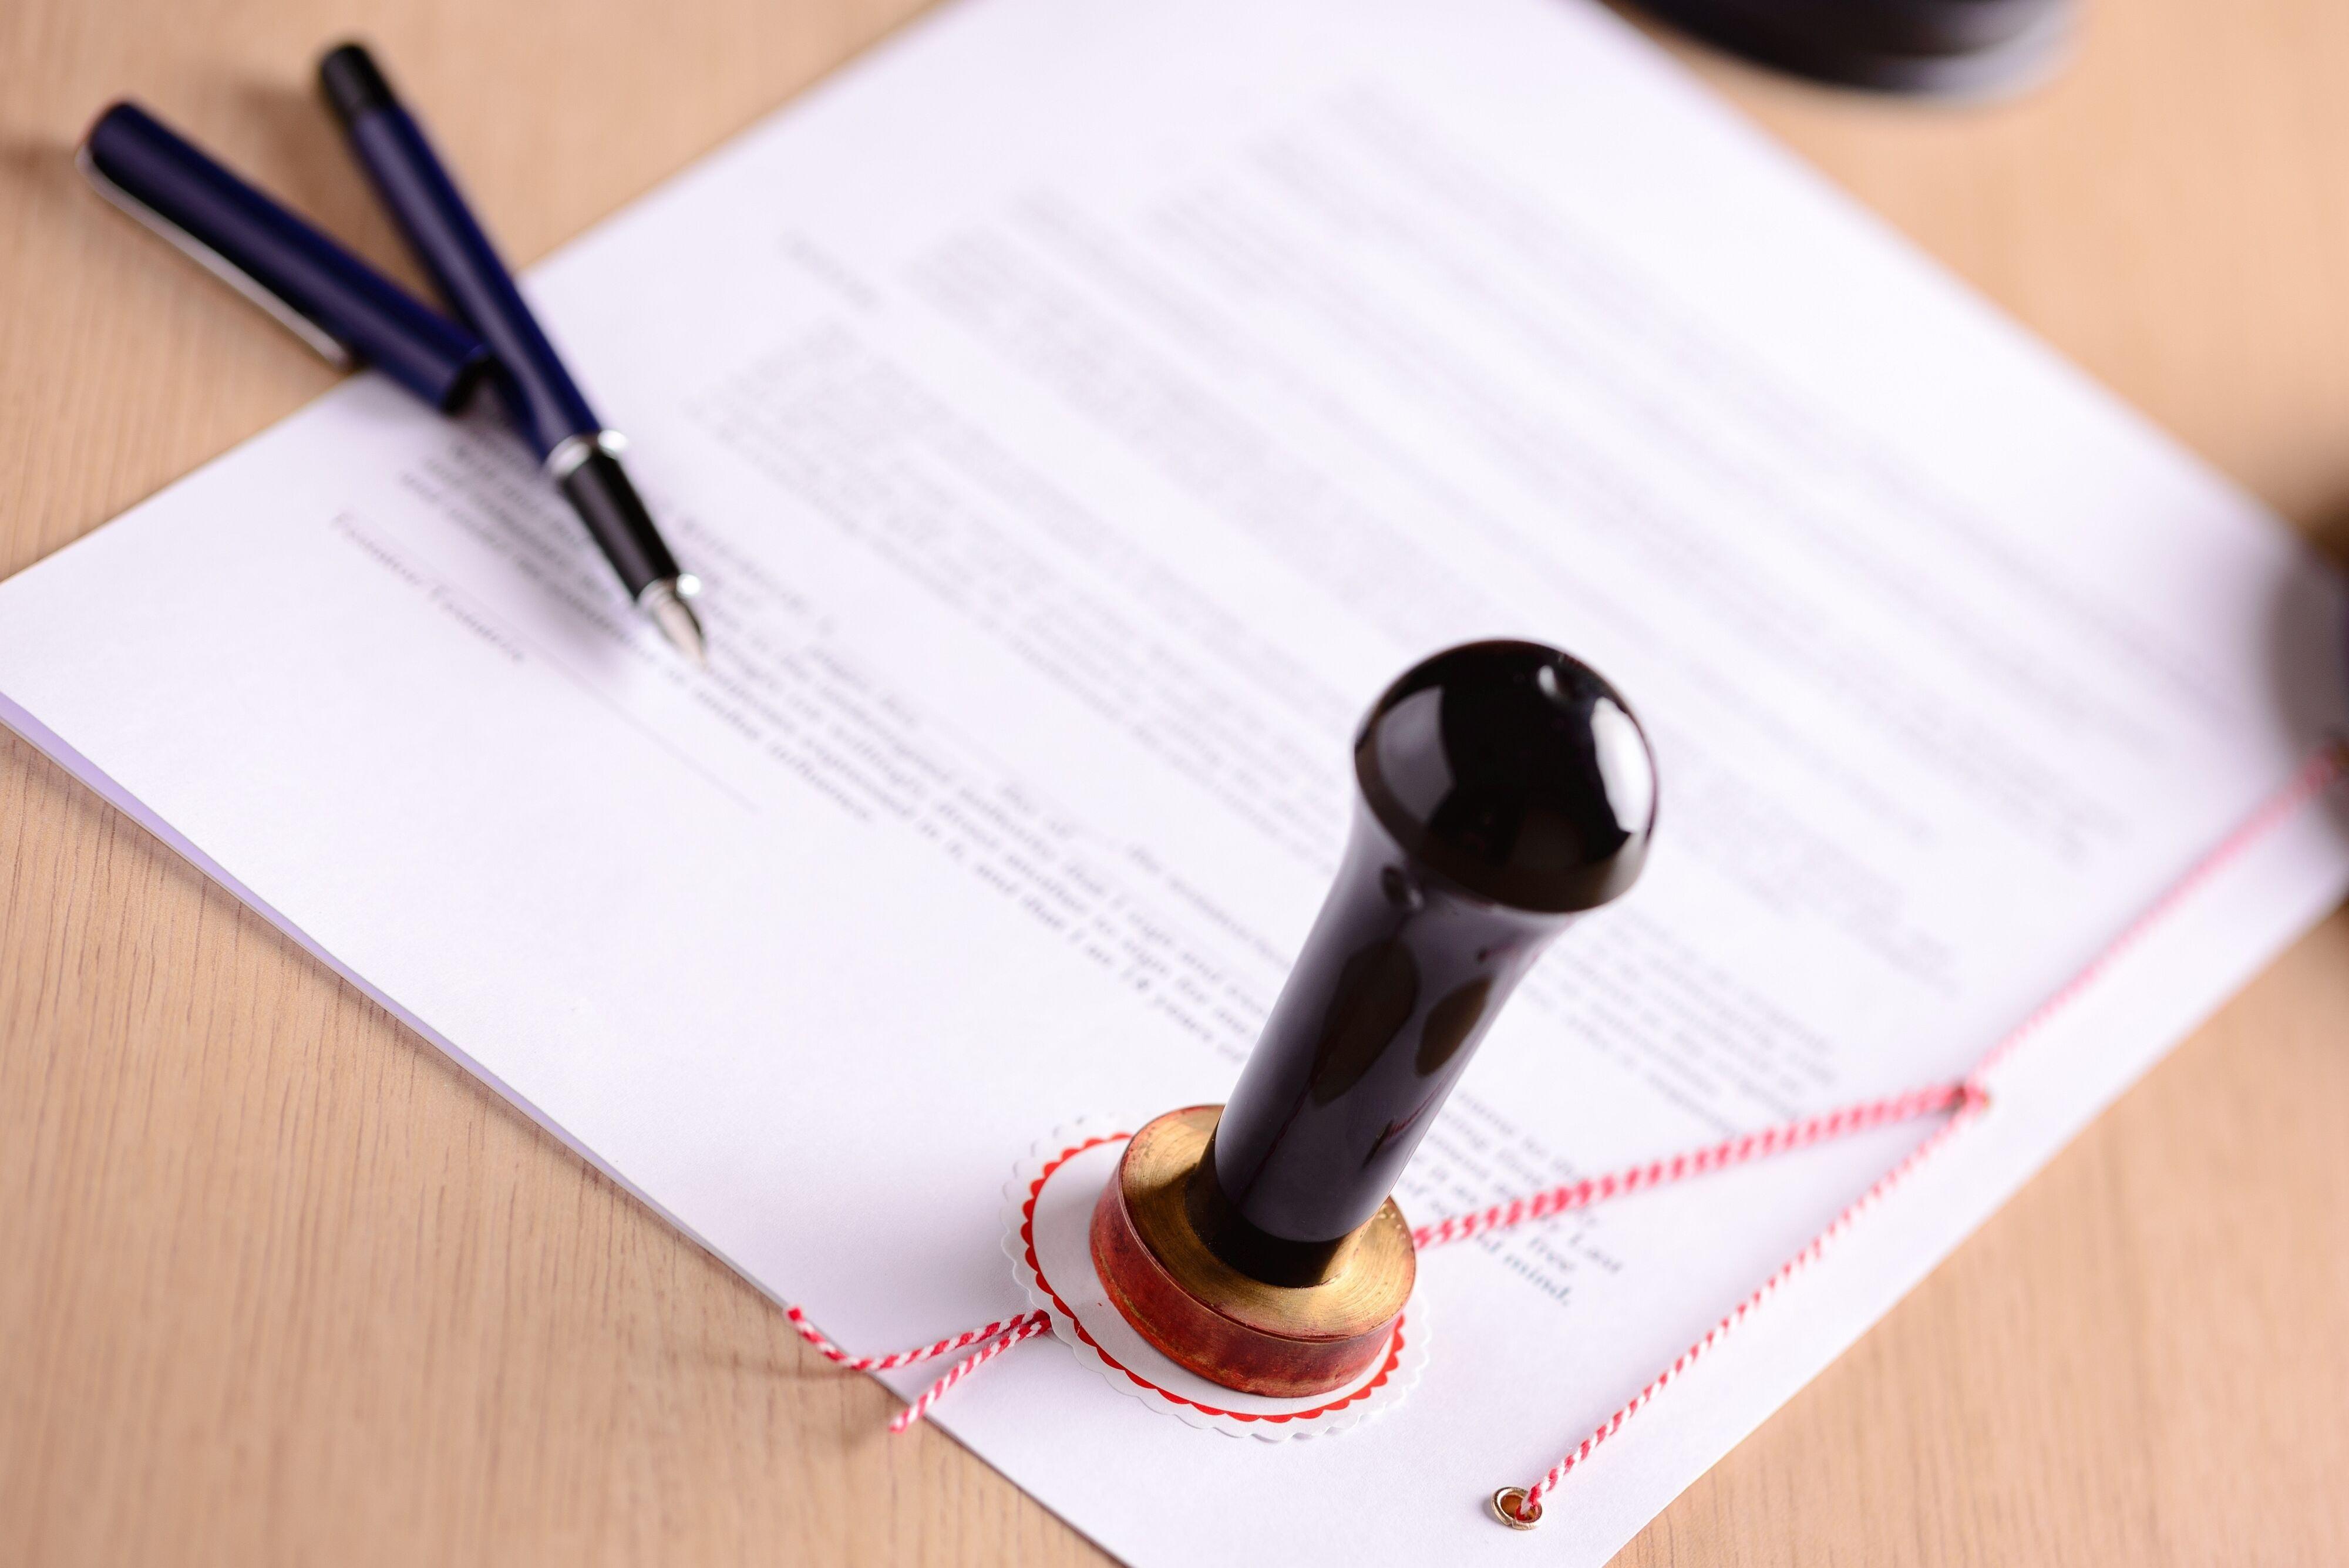 stamp, document, edit, proofread, expert, words, language